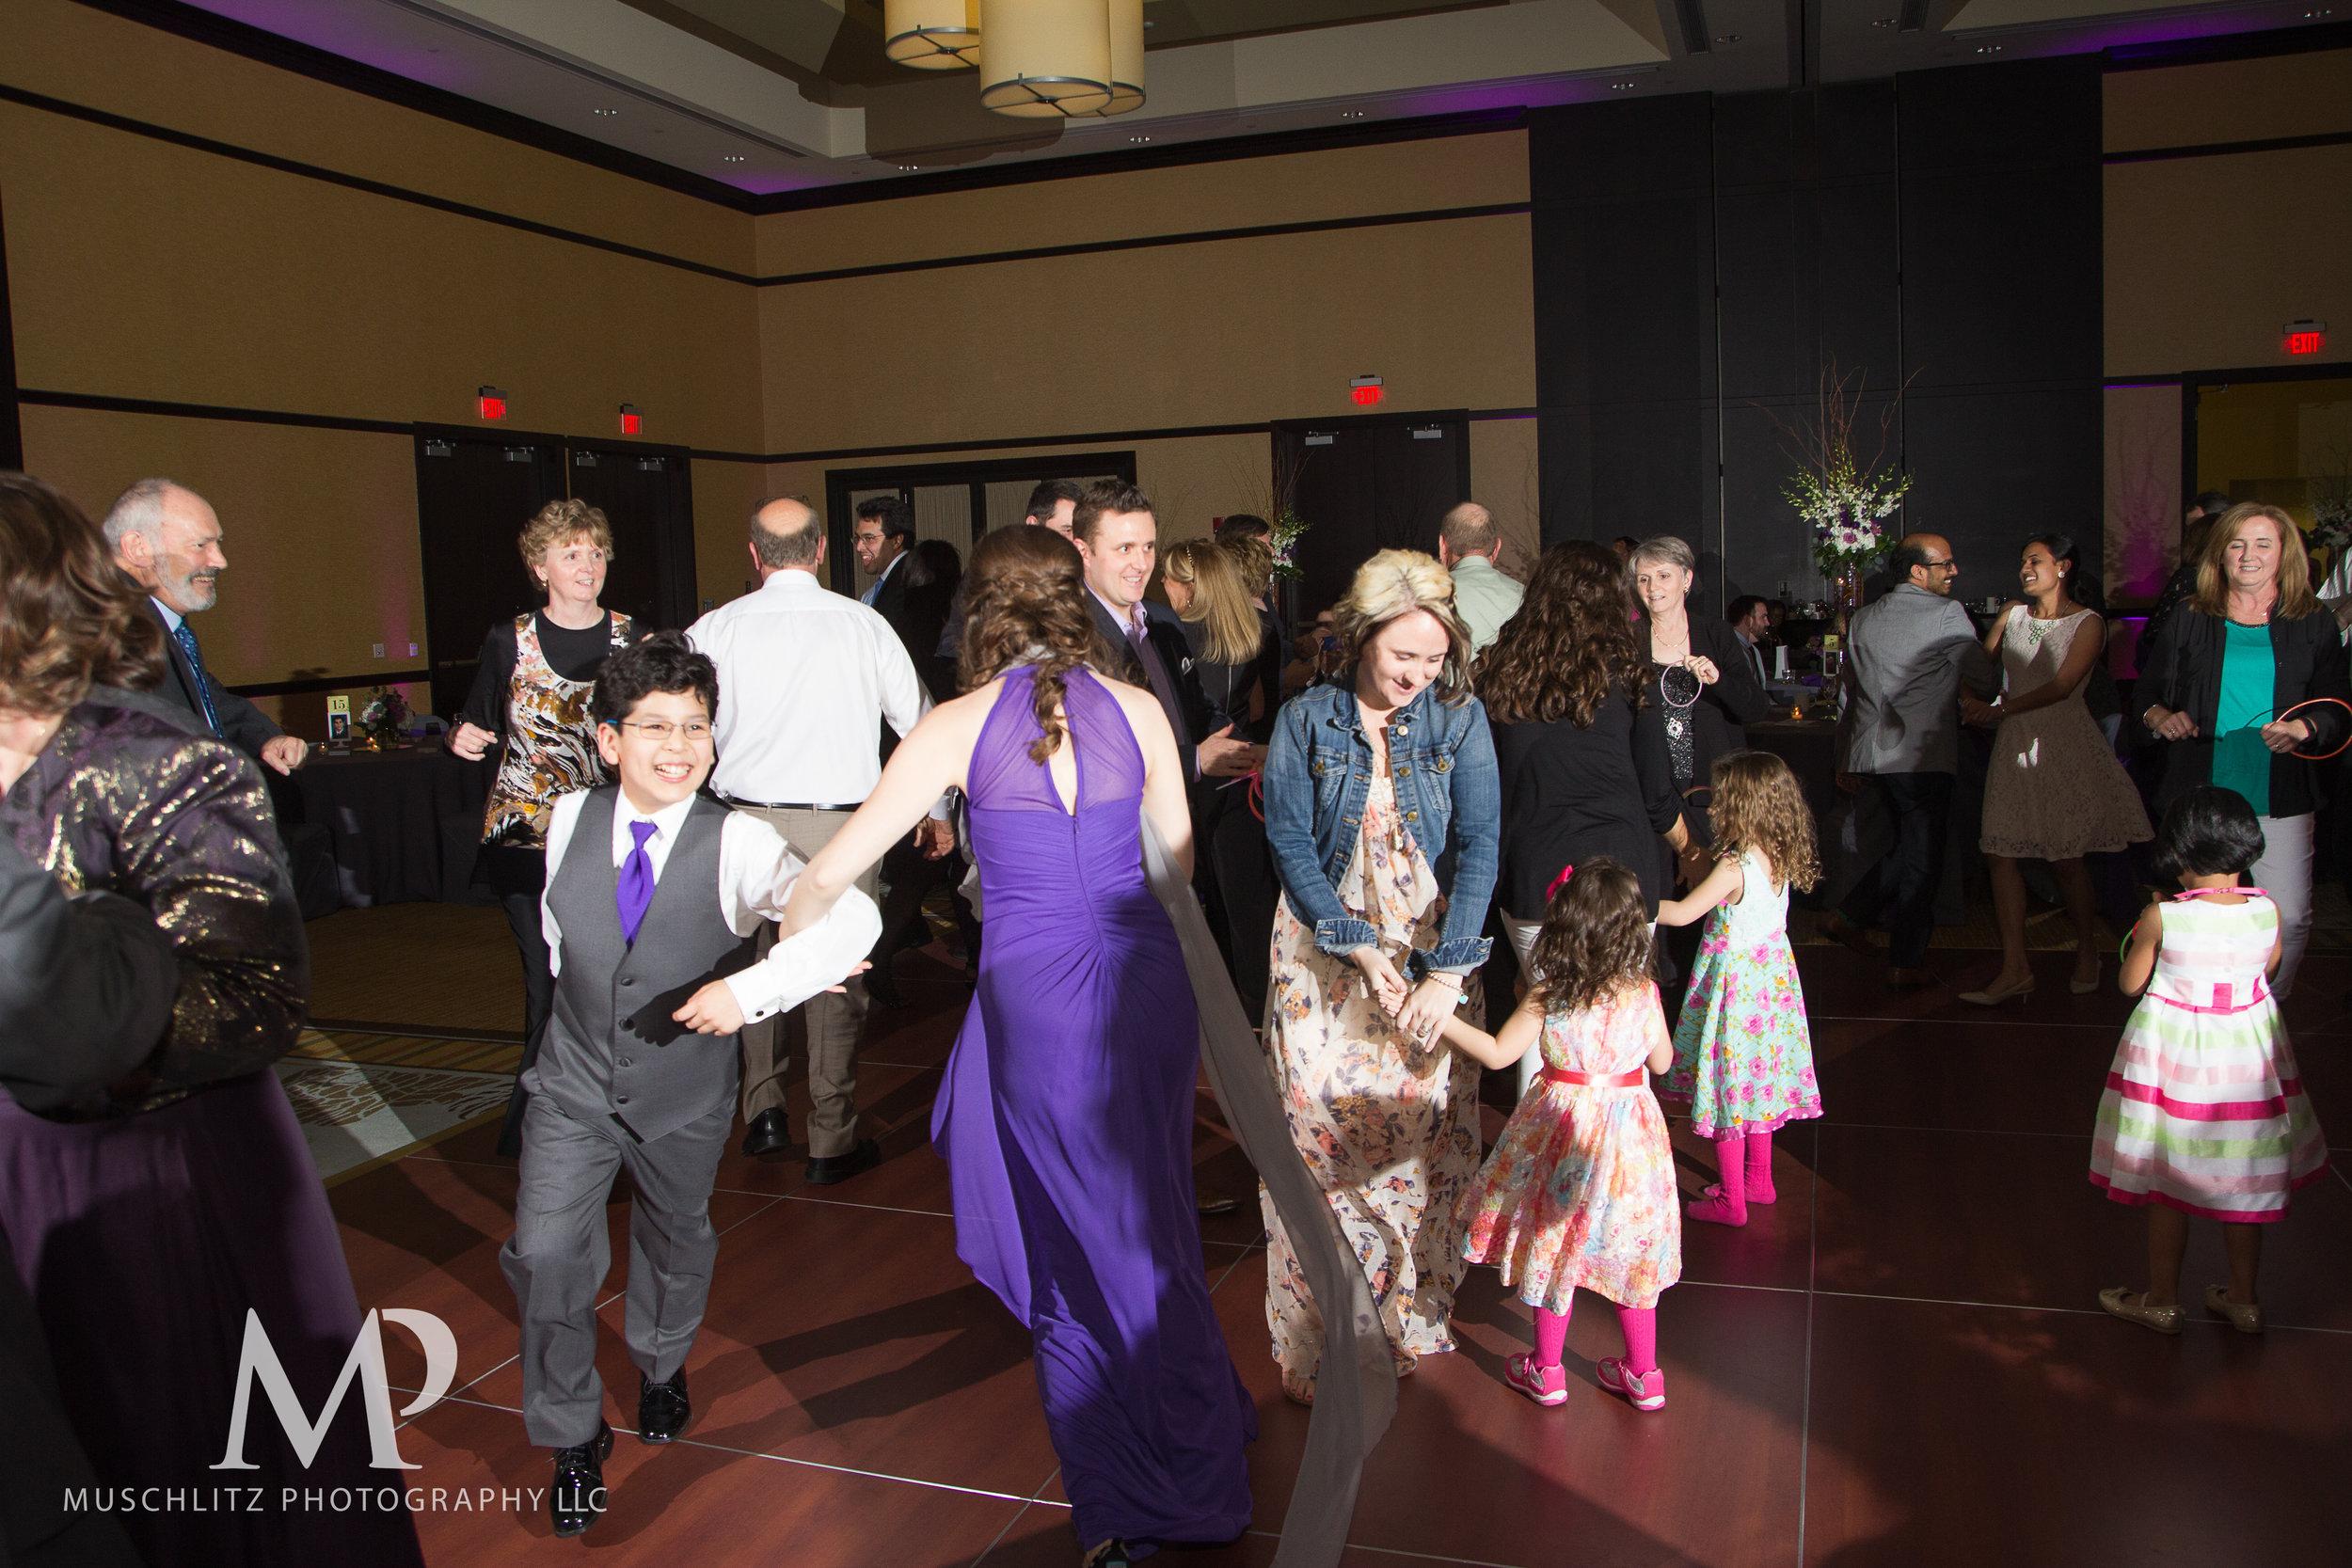 hilton-polaris-wedding-columbus-ohio-muschlitz-photography-058.JPG